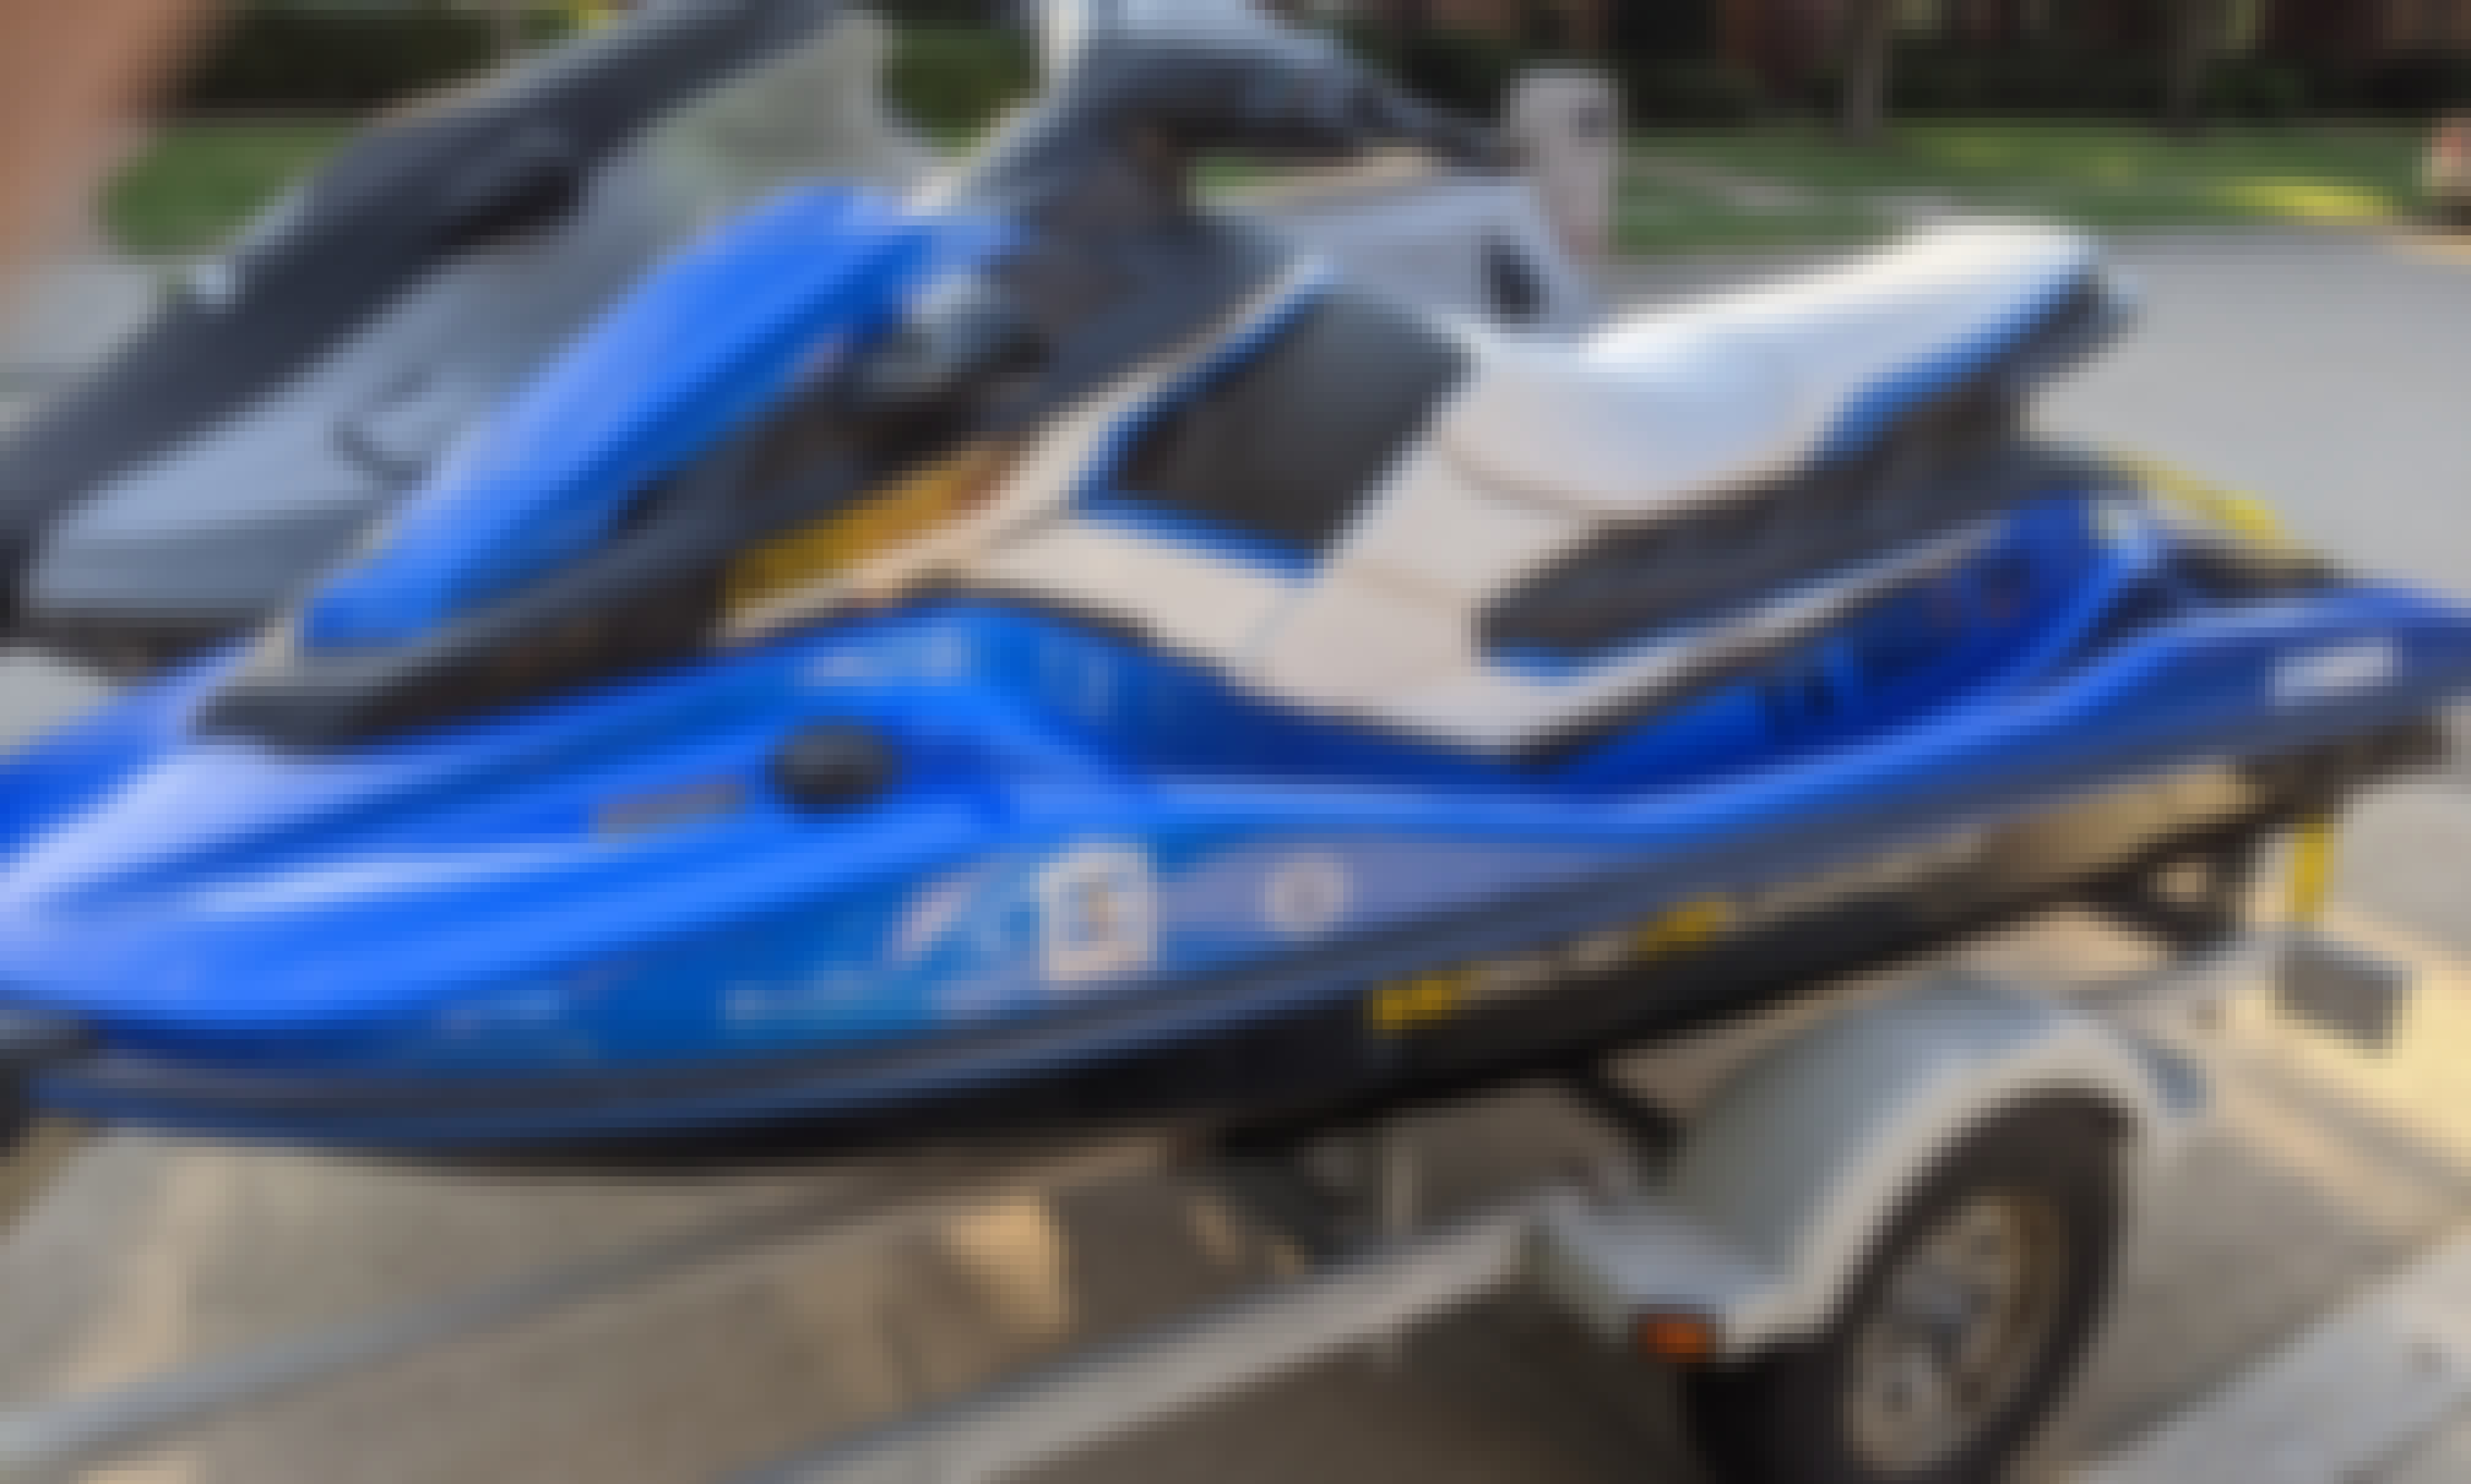 2017 Yamaha EX Deluxe Waverunner